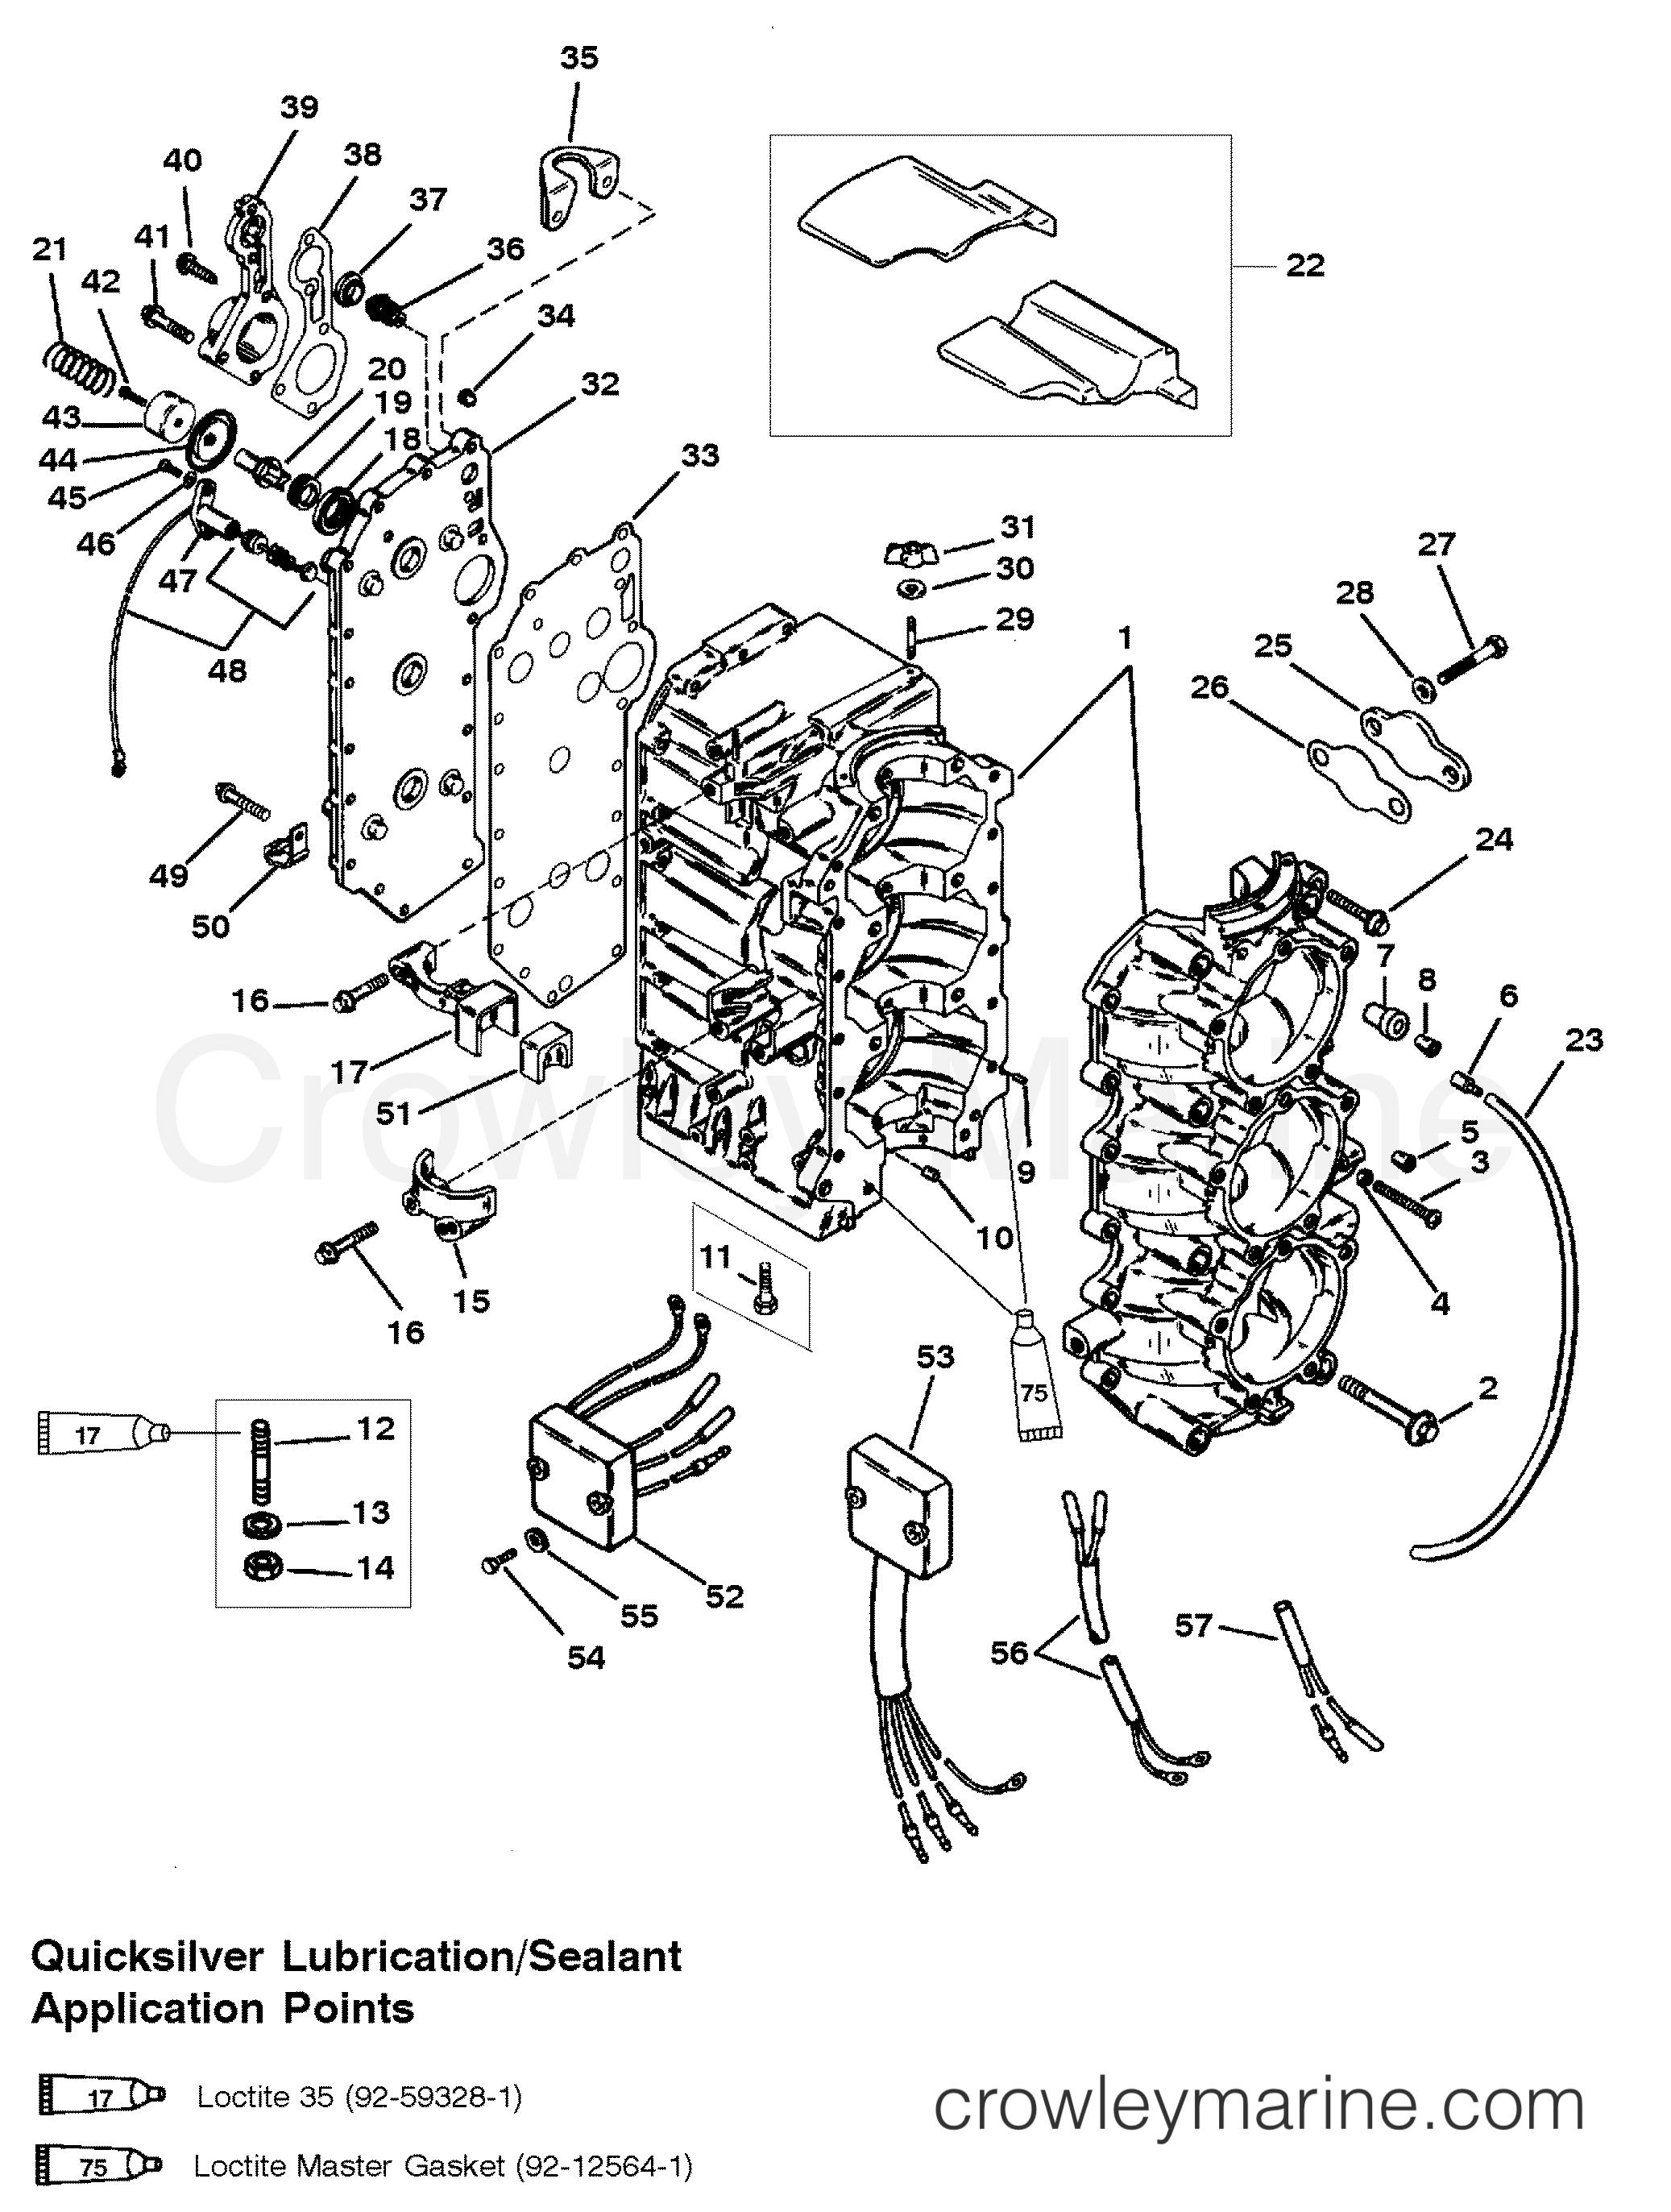 1994 Mercury Outboard 75 [ELH] - 1075357PD - CYLINDER BLOCK (USA-0G127499/BEL-9836632 & BELOW) section